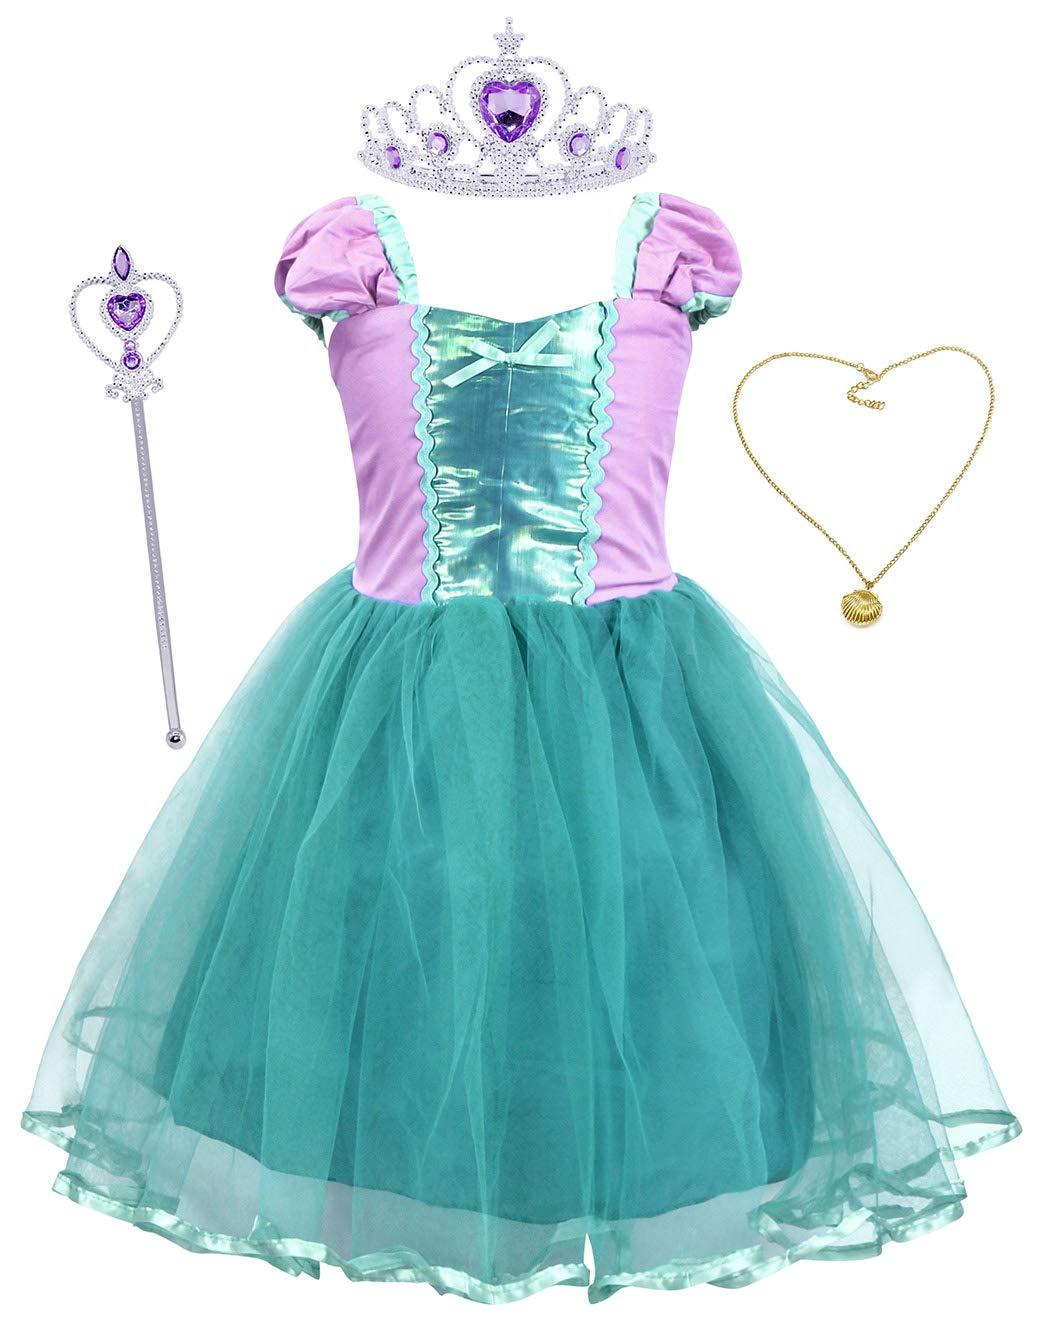 HenzWorld Mermaid Tutu Dress Princess Costume Birthday Party Cosplay Headband Jewelry Accessories Little Girls Outfits